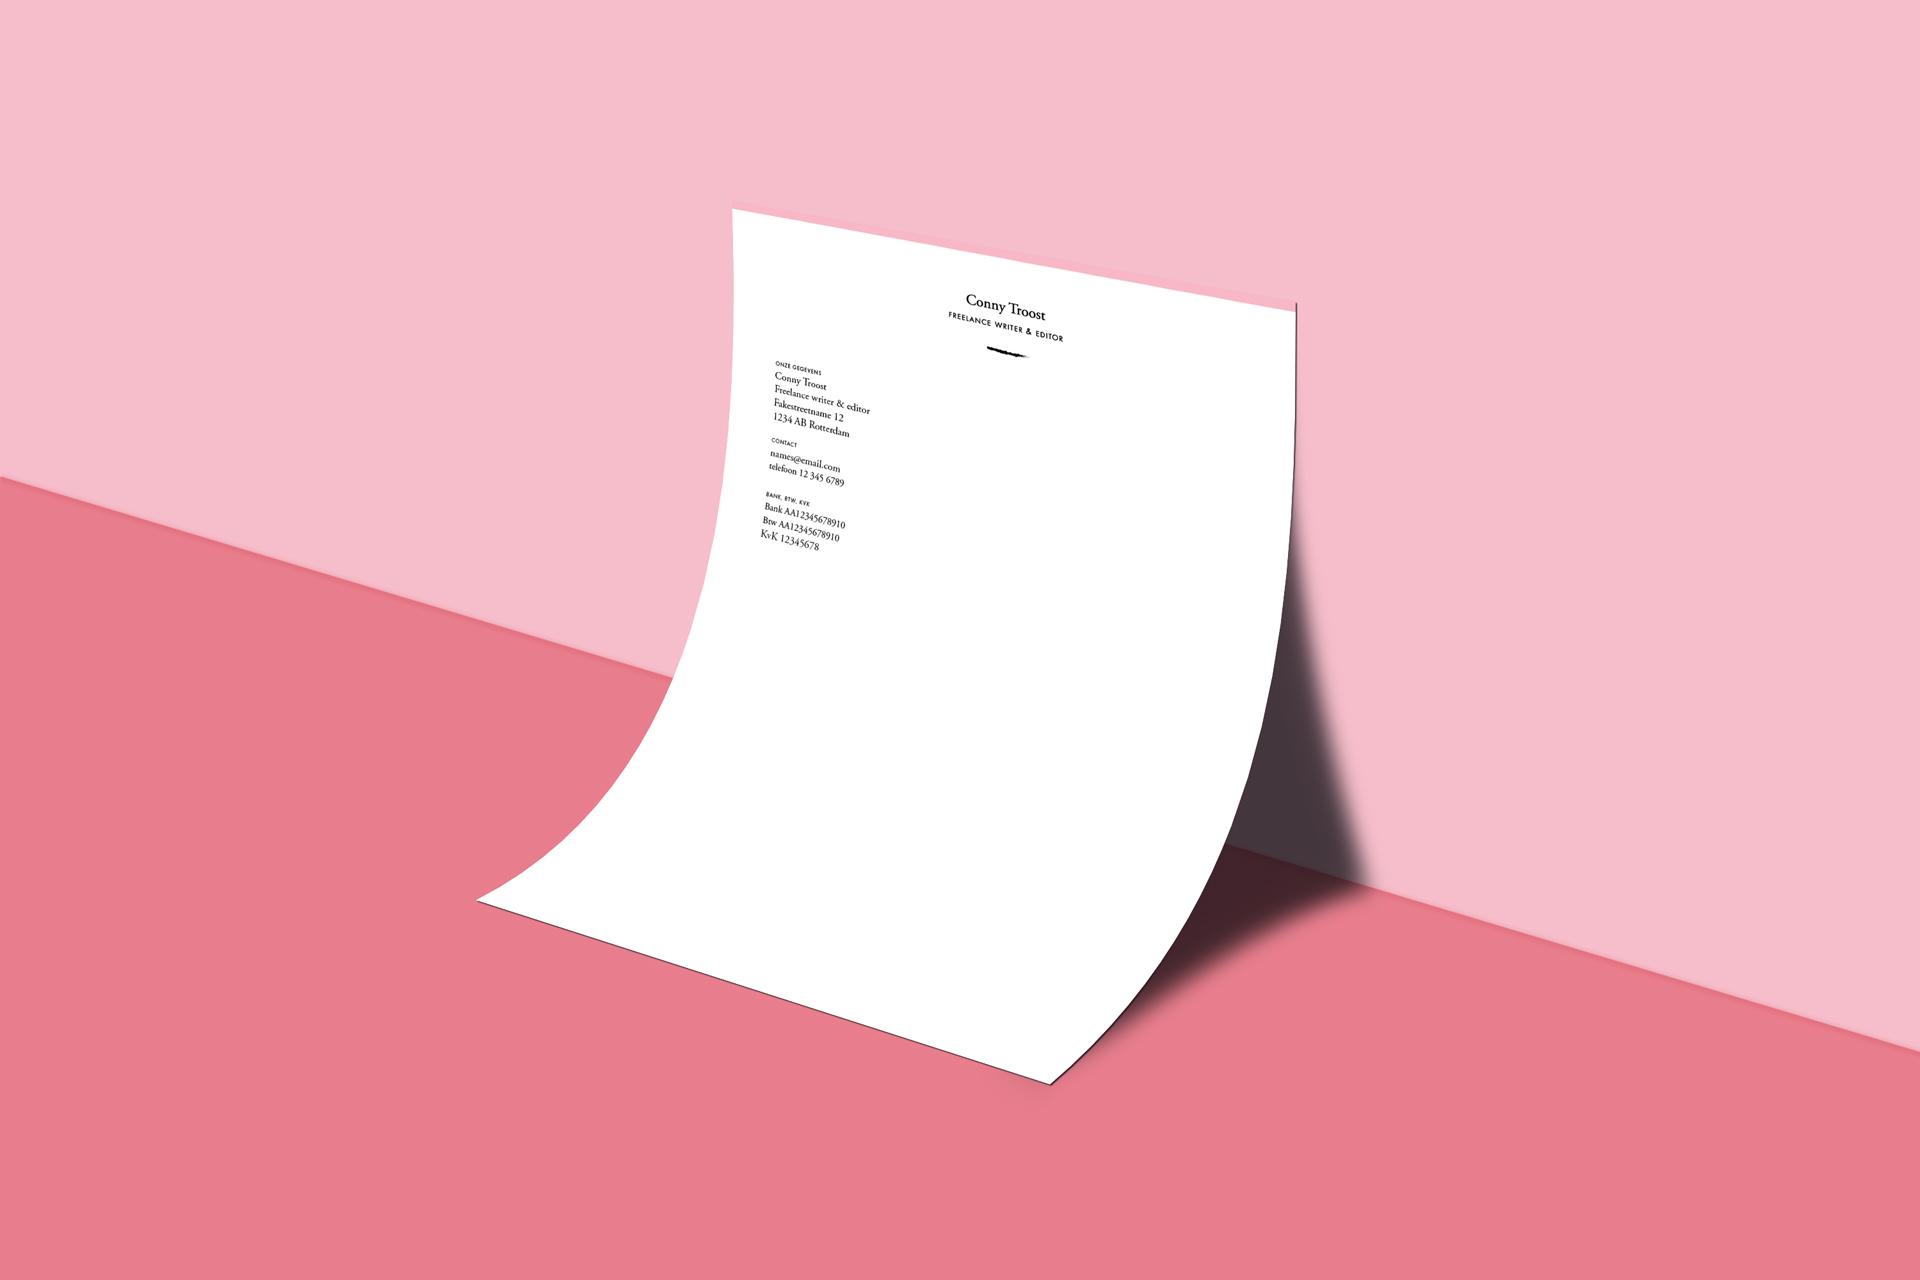 leconcepteur_designer_branding_conny_troost_briefpapier